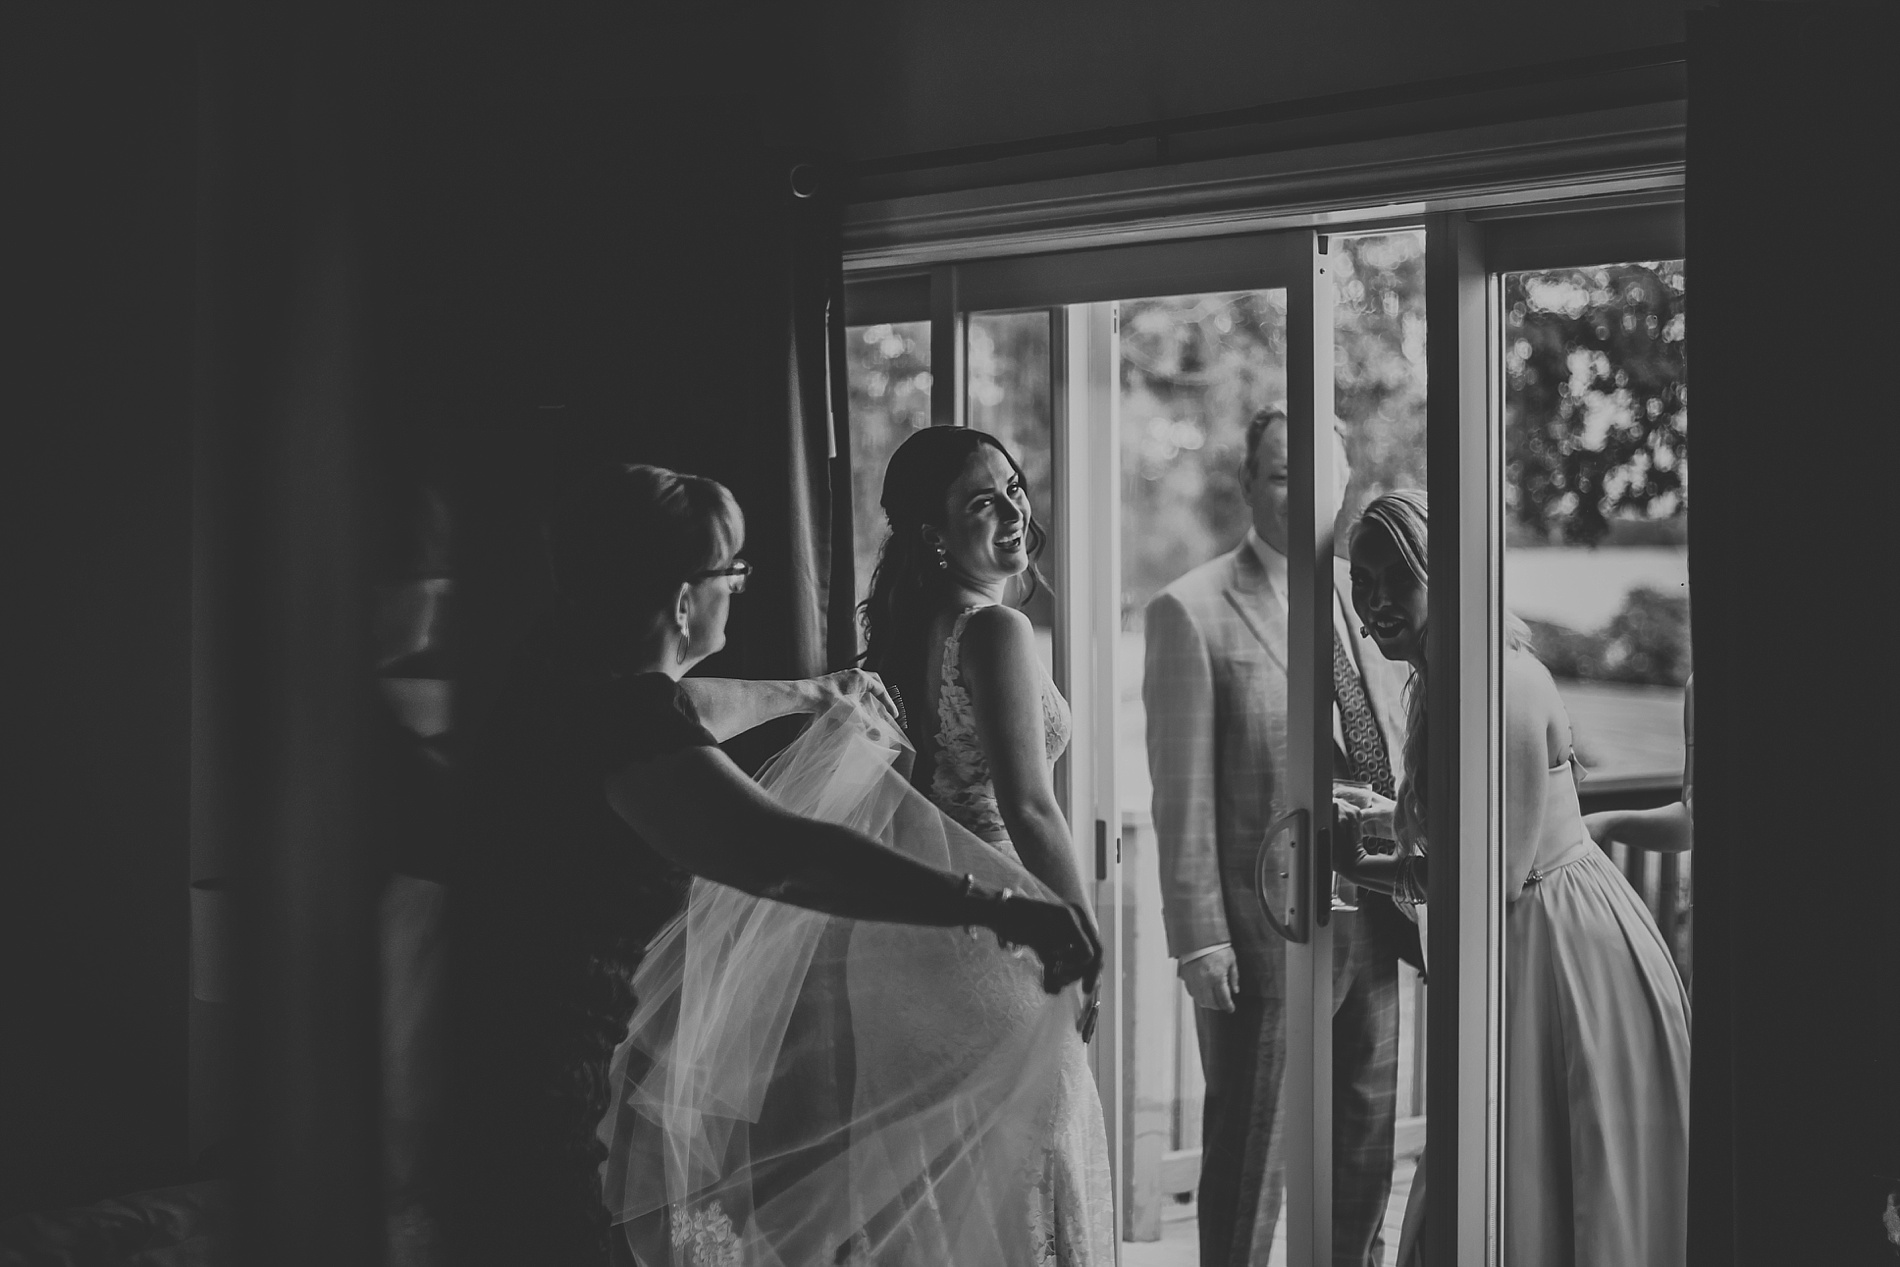 Kawartha_Lakes_Wedding_Bobcageon_Eganridge_Resort_Toronto_Photographer_0017.jpg